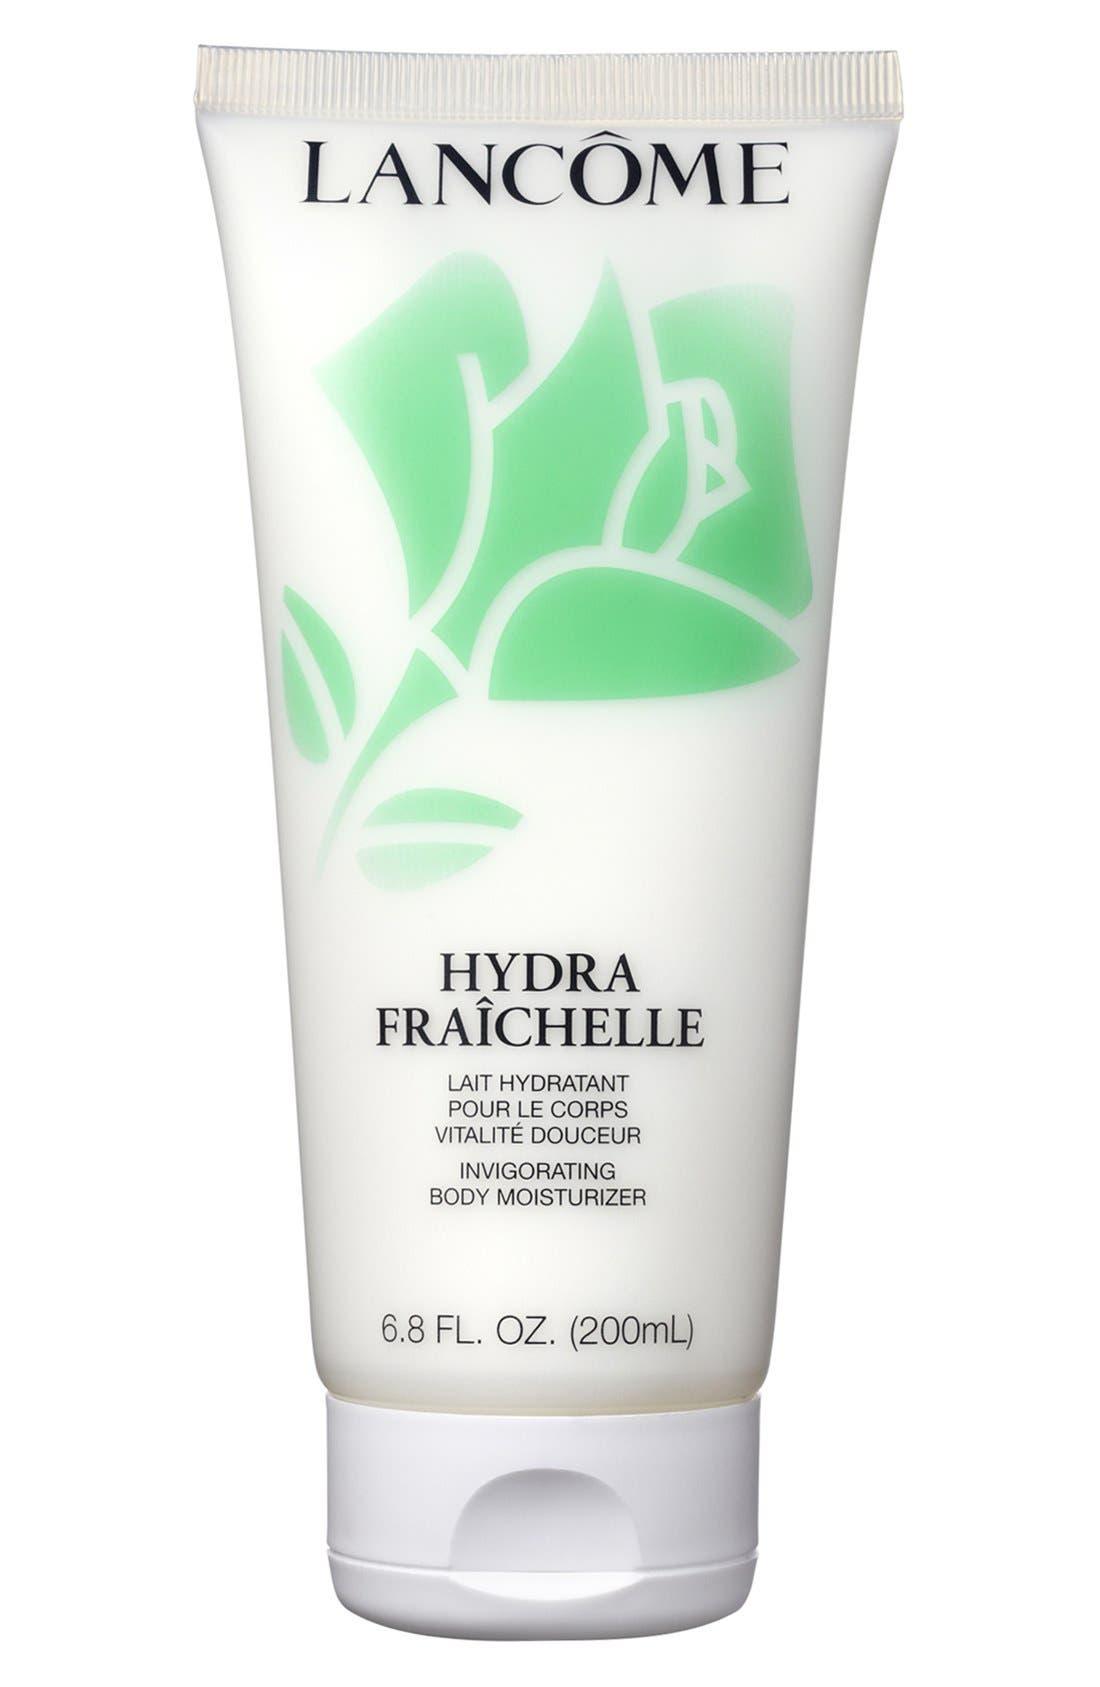 Lancome Hydra Fraichelle Invigorating Body Moisturizer